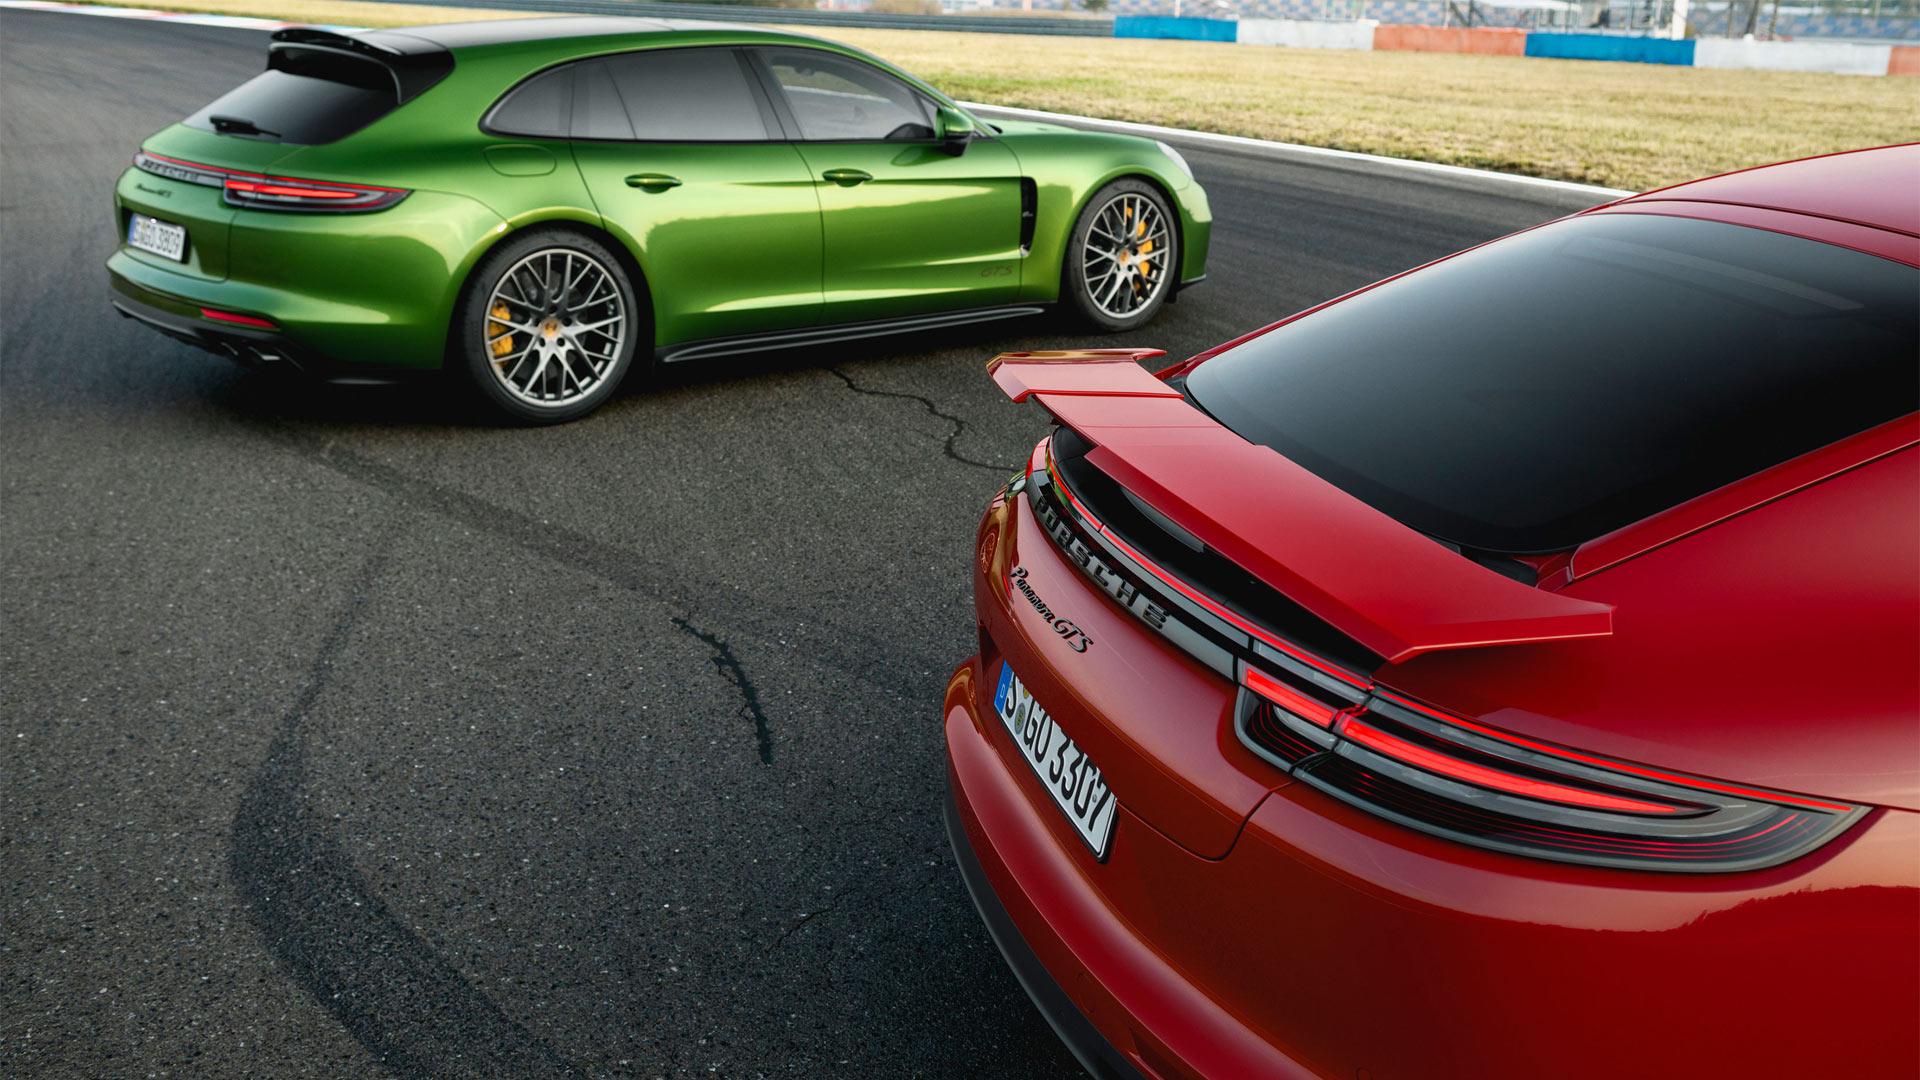 2018-2nd-generation-Porsche-Panamera-GTS-and-Panamera-GTS-Sport-Turismo_2